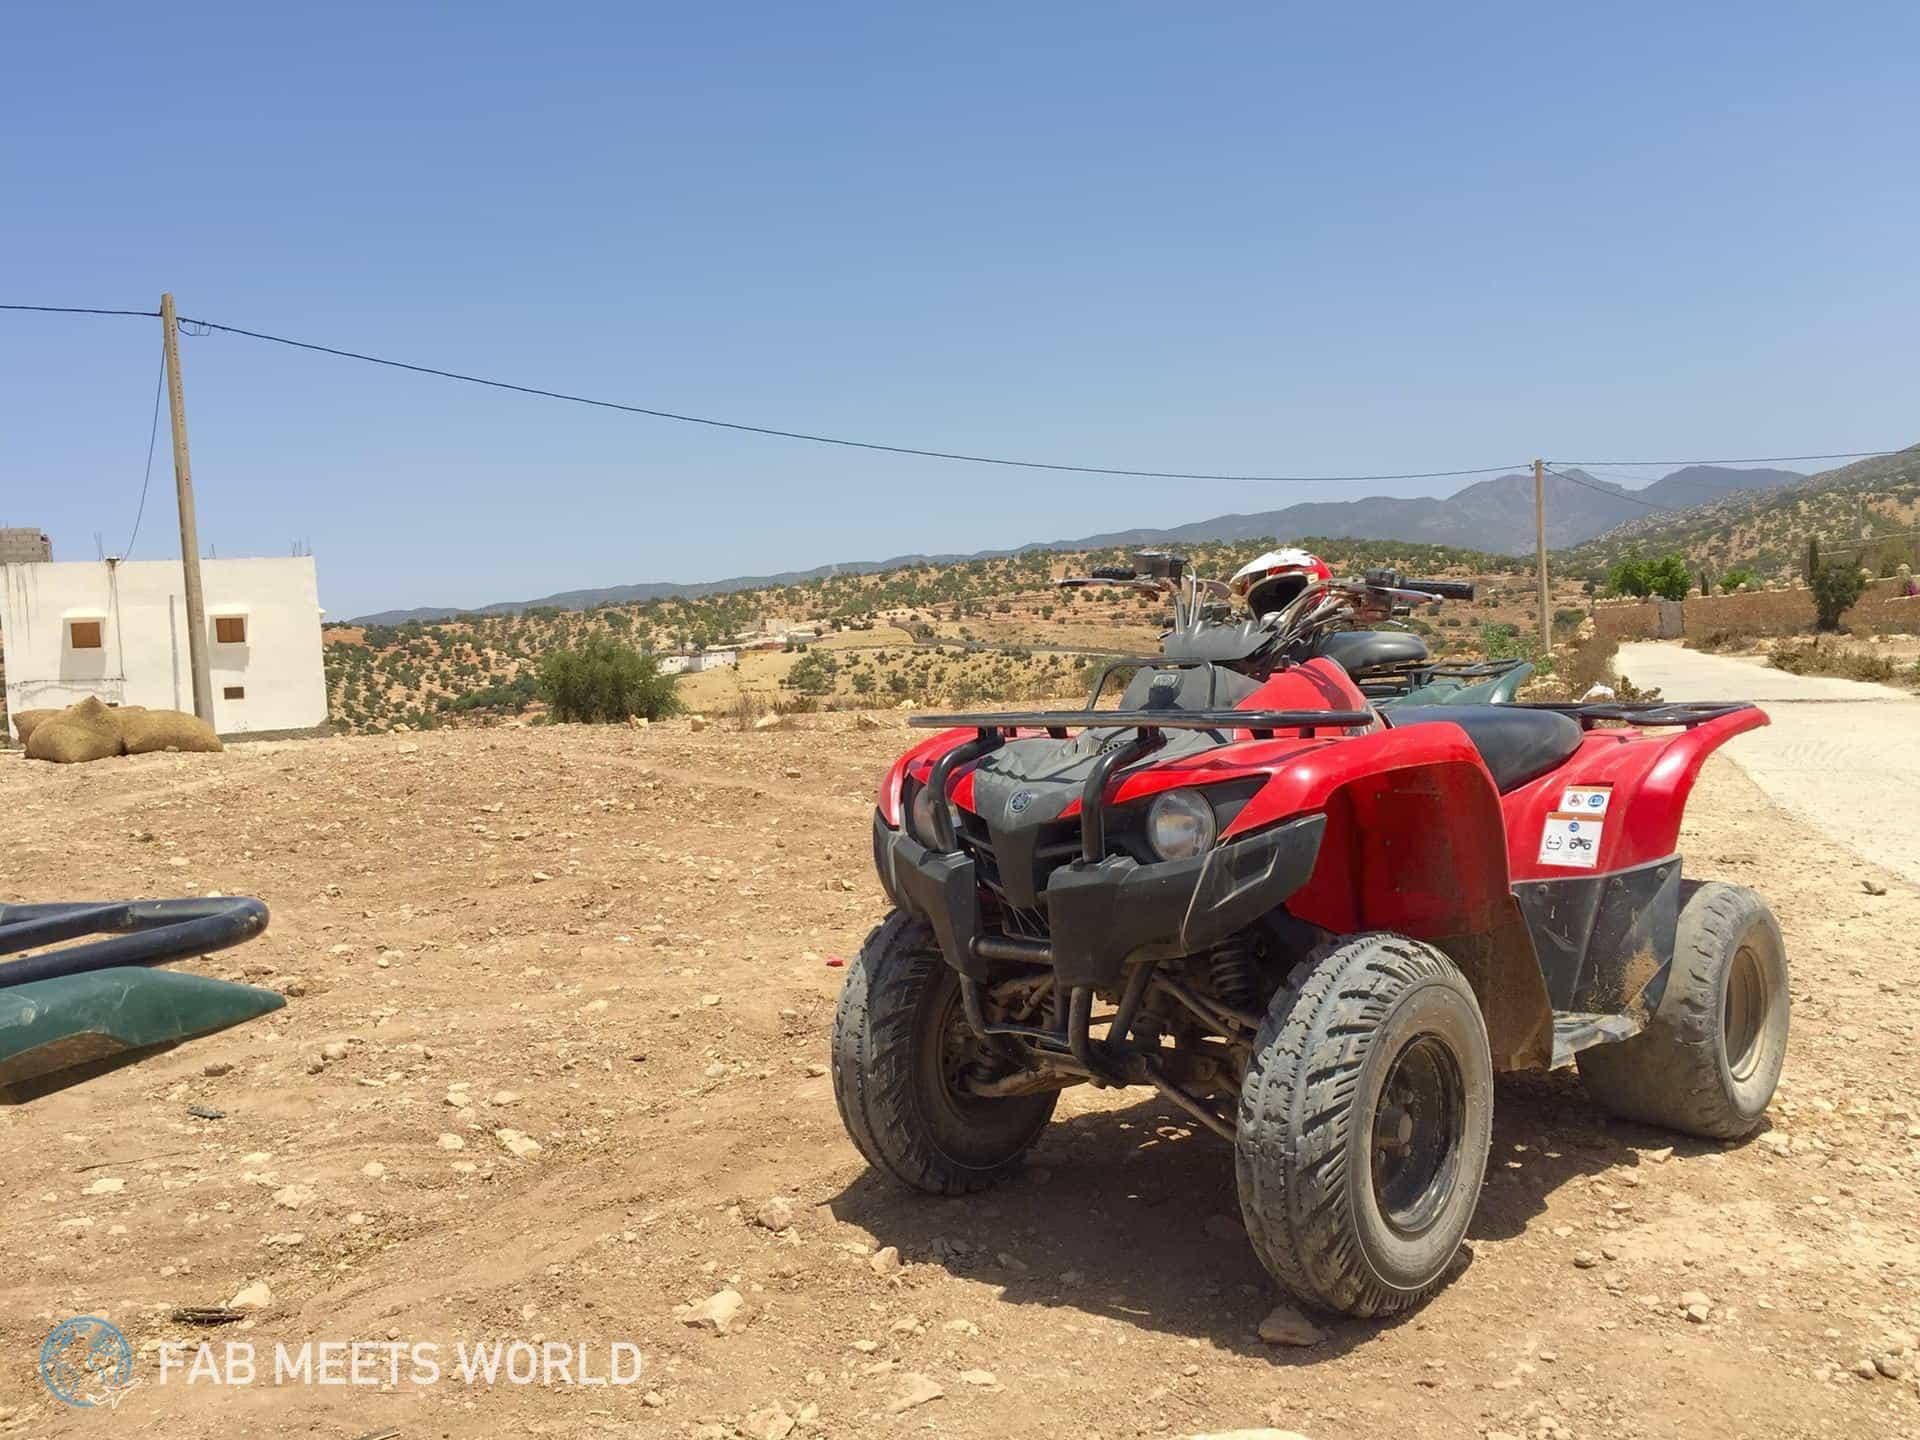 Quad biking & jet skiing in Agadir, Morocco (Video)